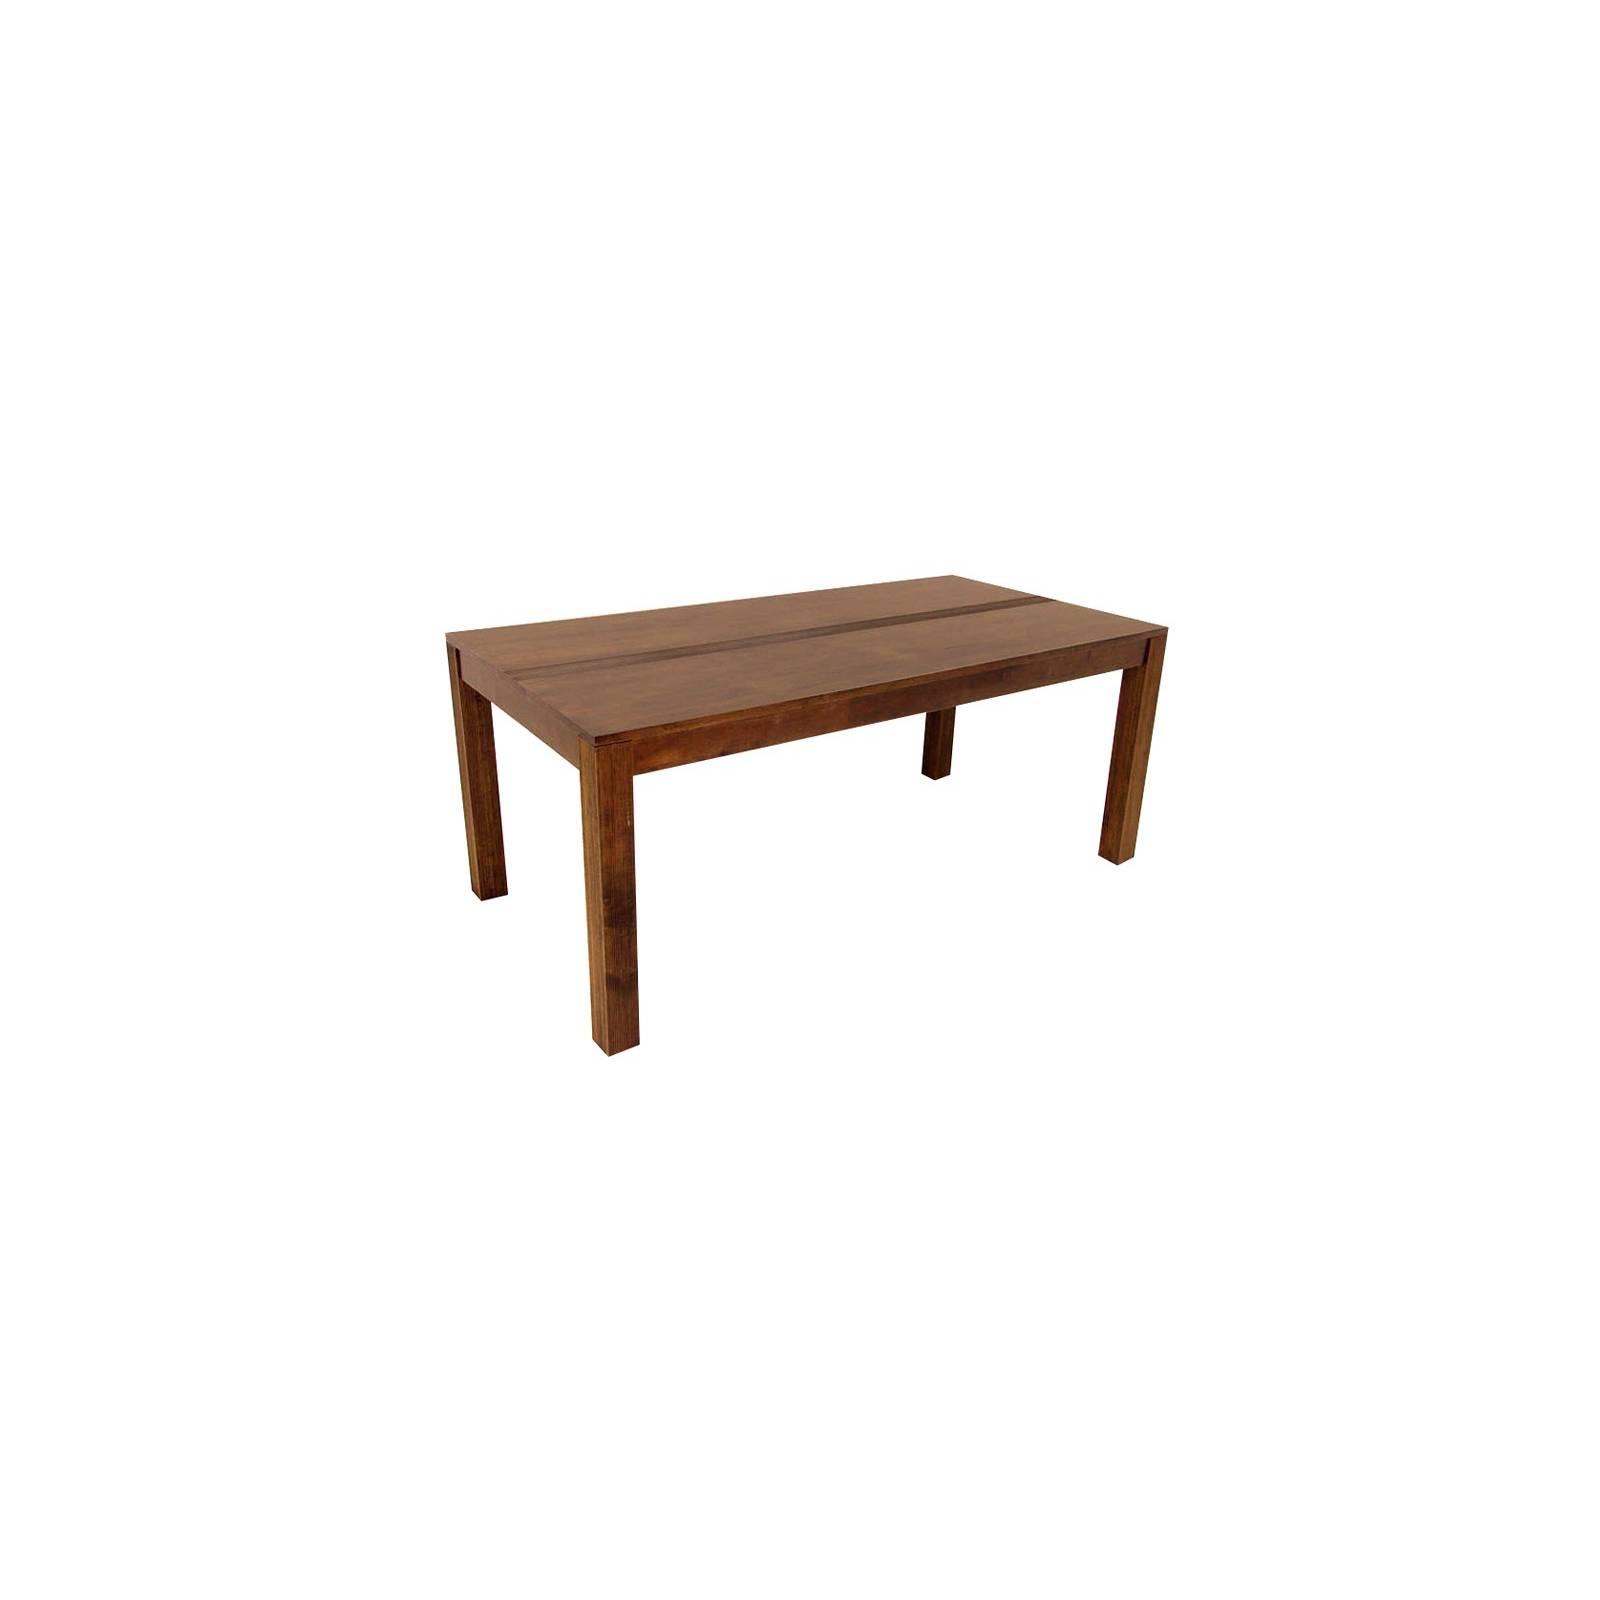 Table Repas Démontable Striée Siguiri Hévéa - meuble bois massif